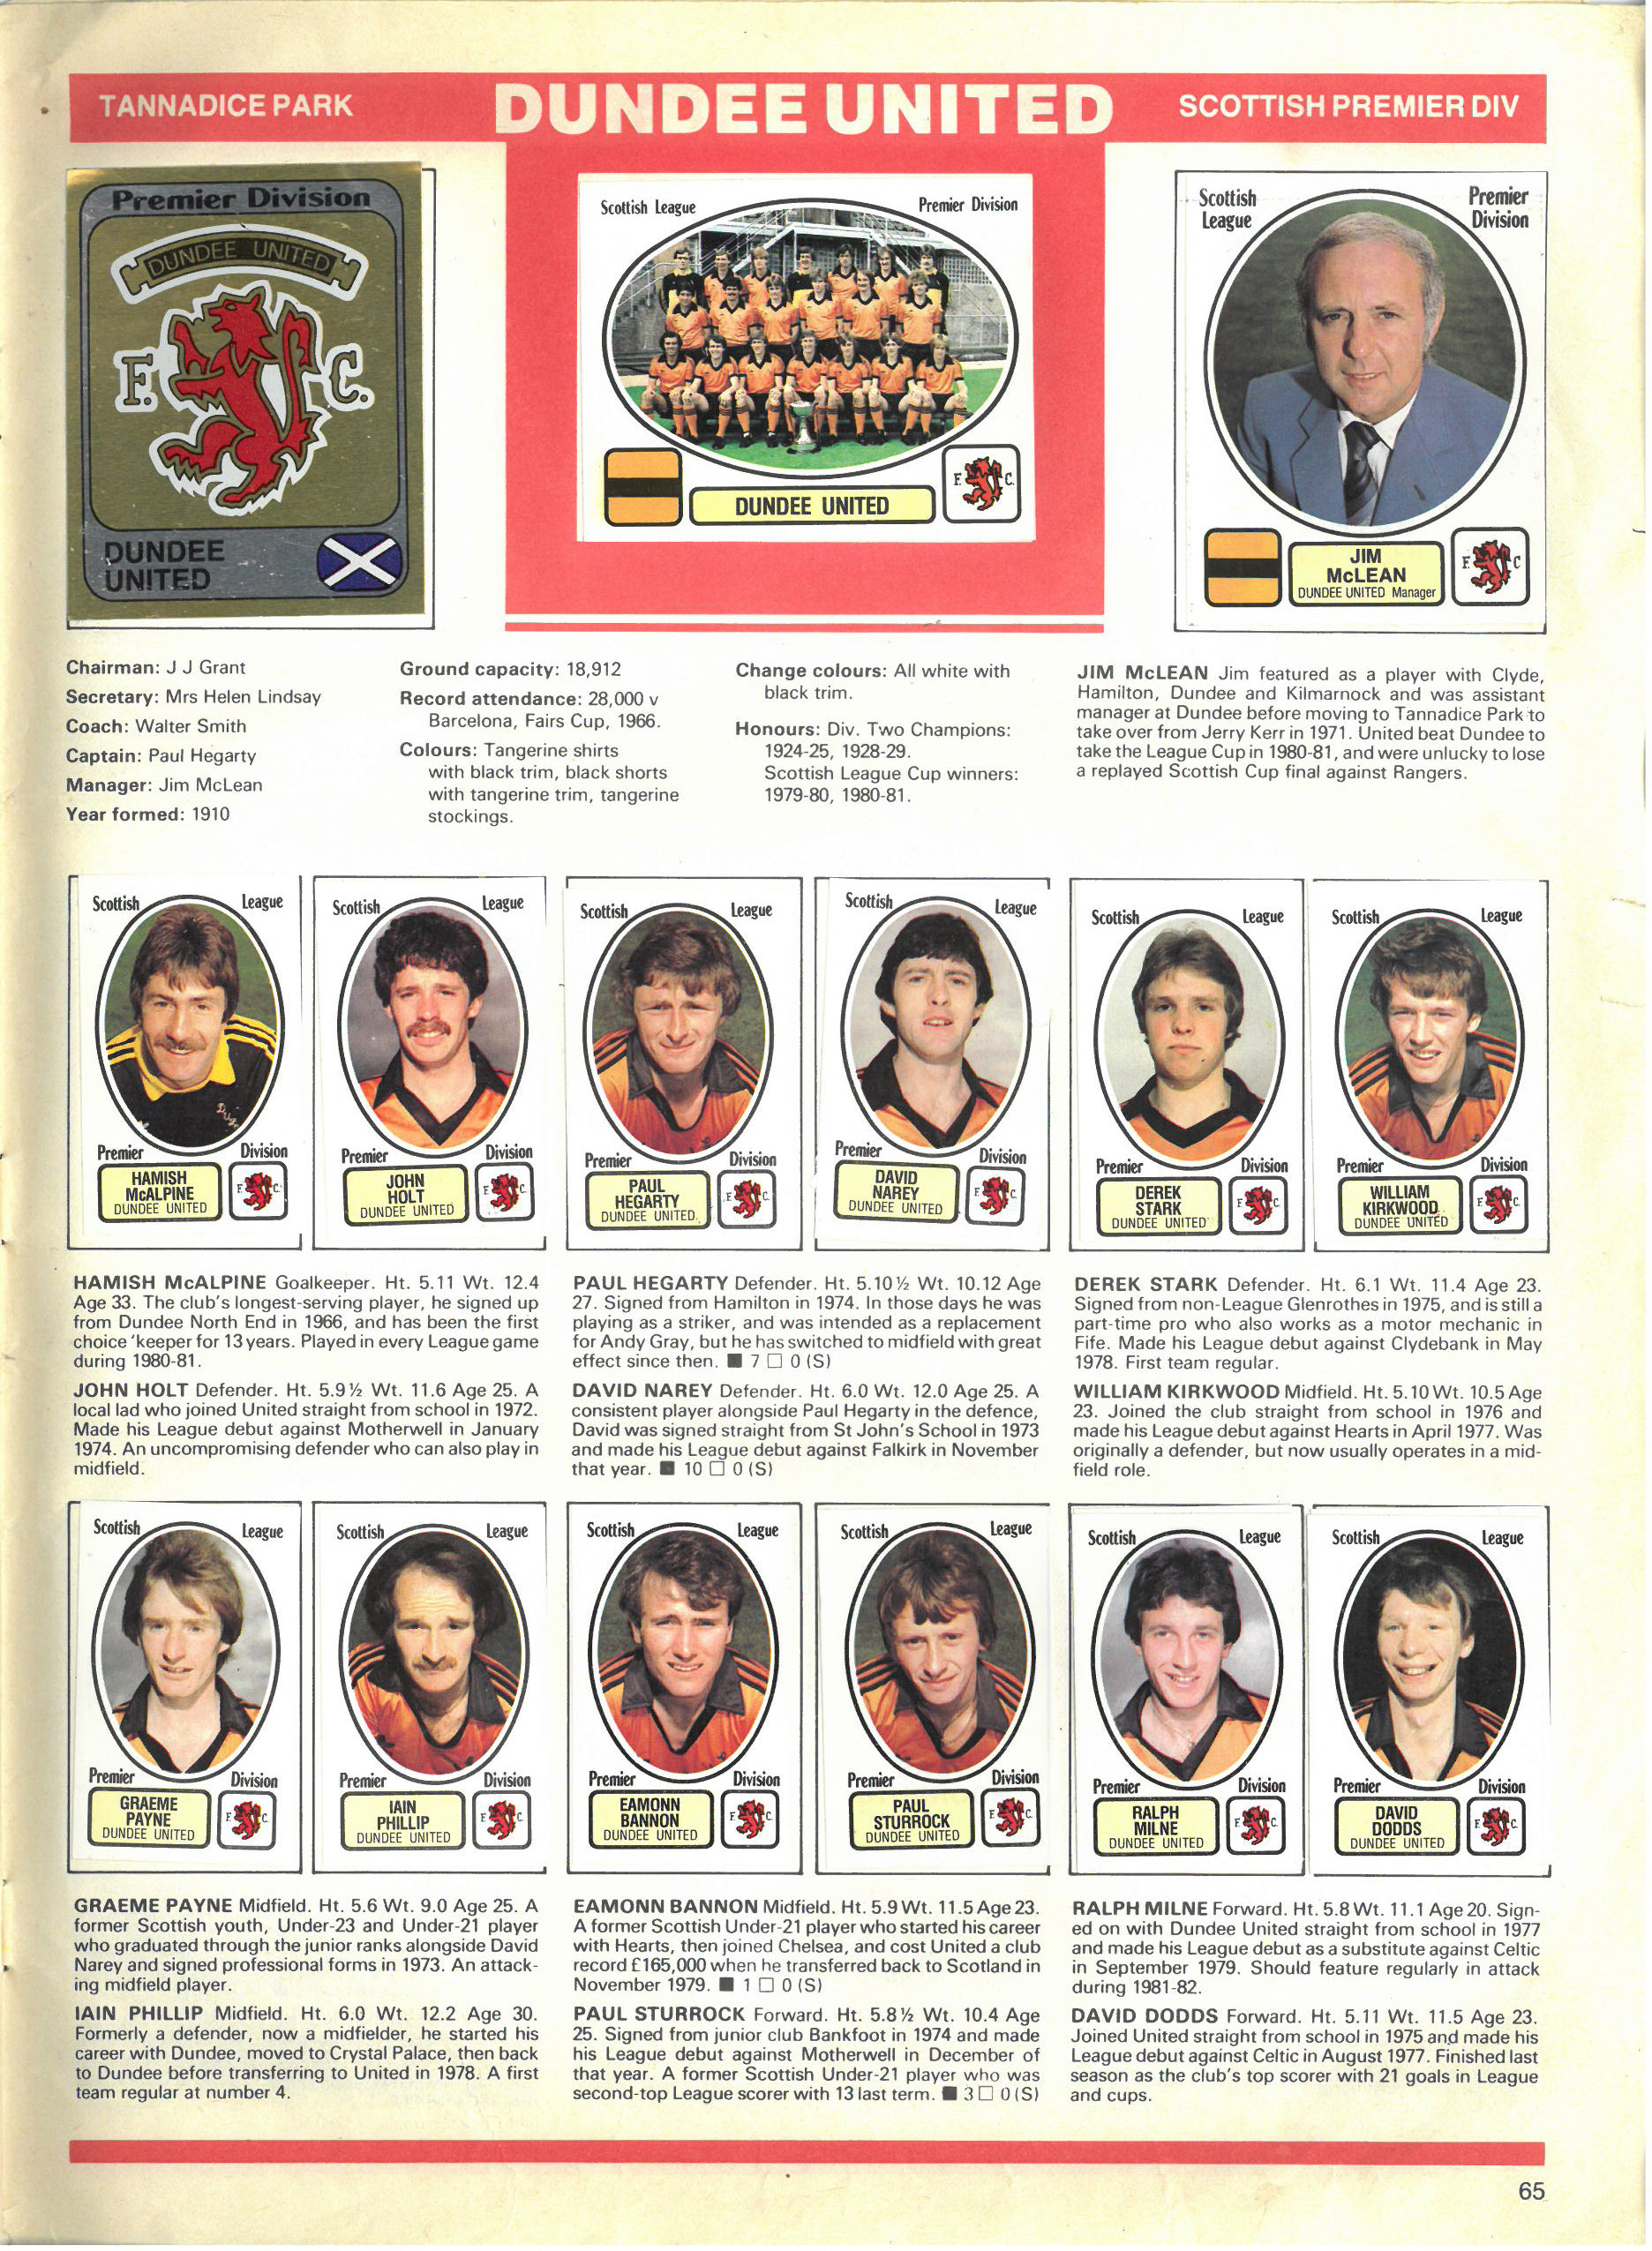 Dundee United 1982